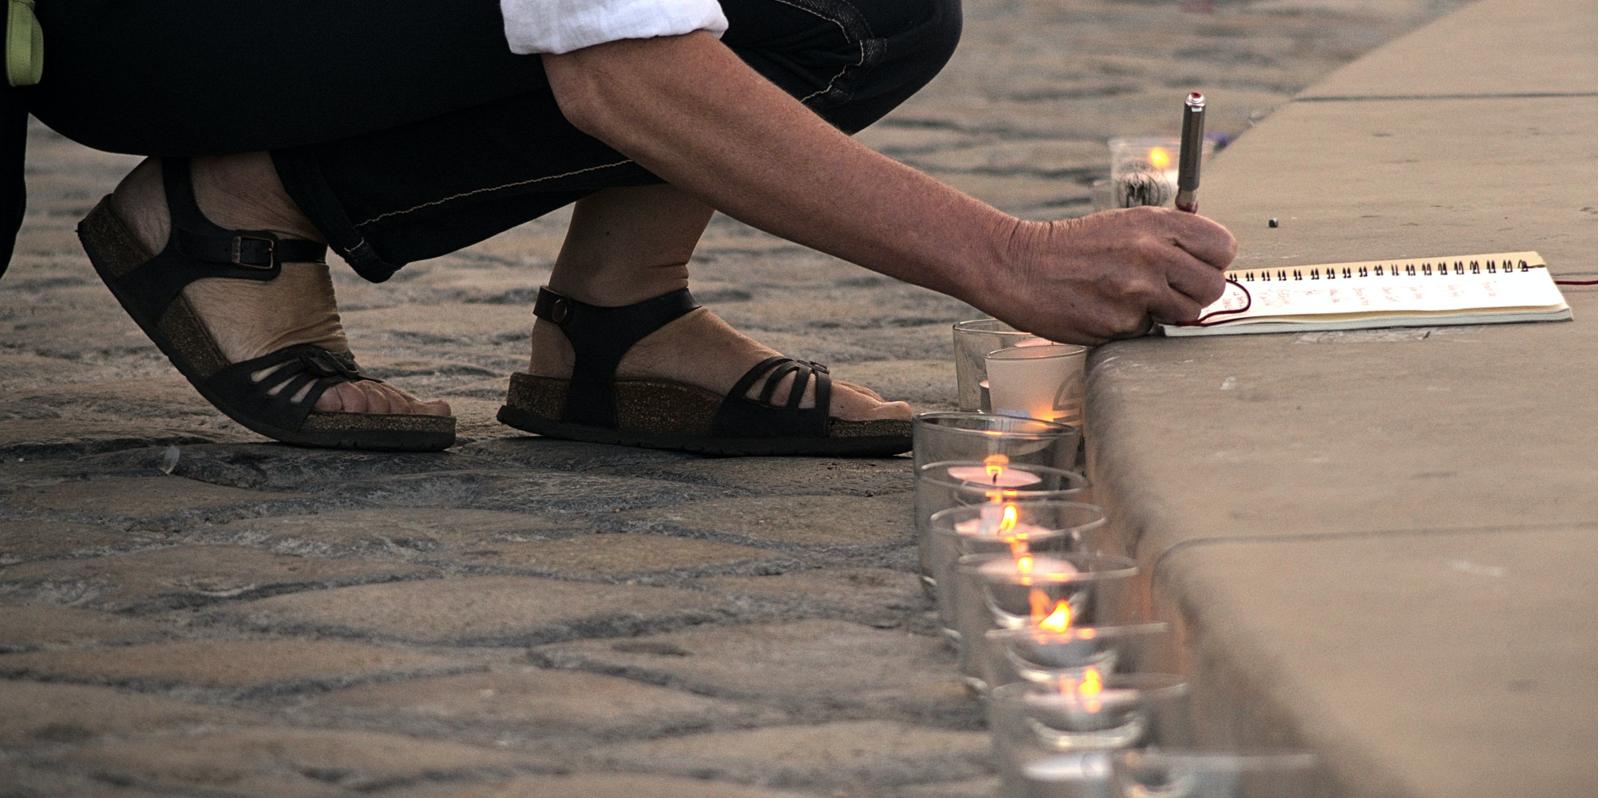 Vendredi 10 Juillet à 20h: Veillée de deuil collectif